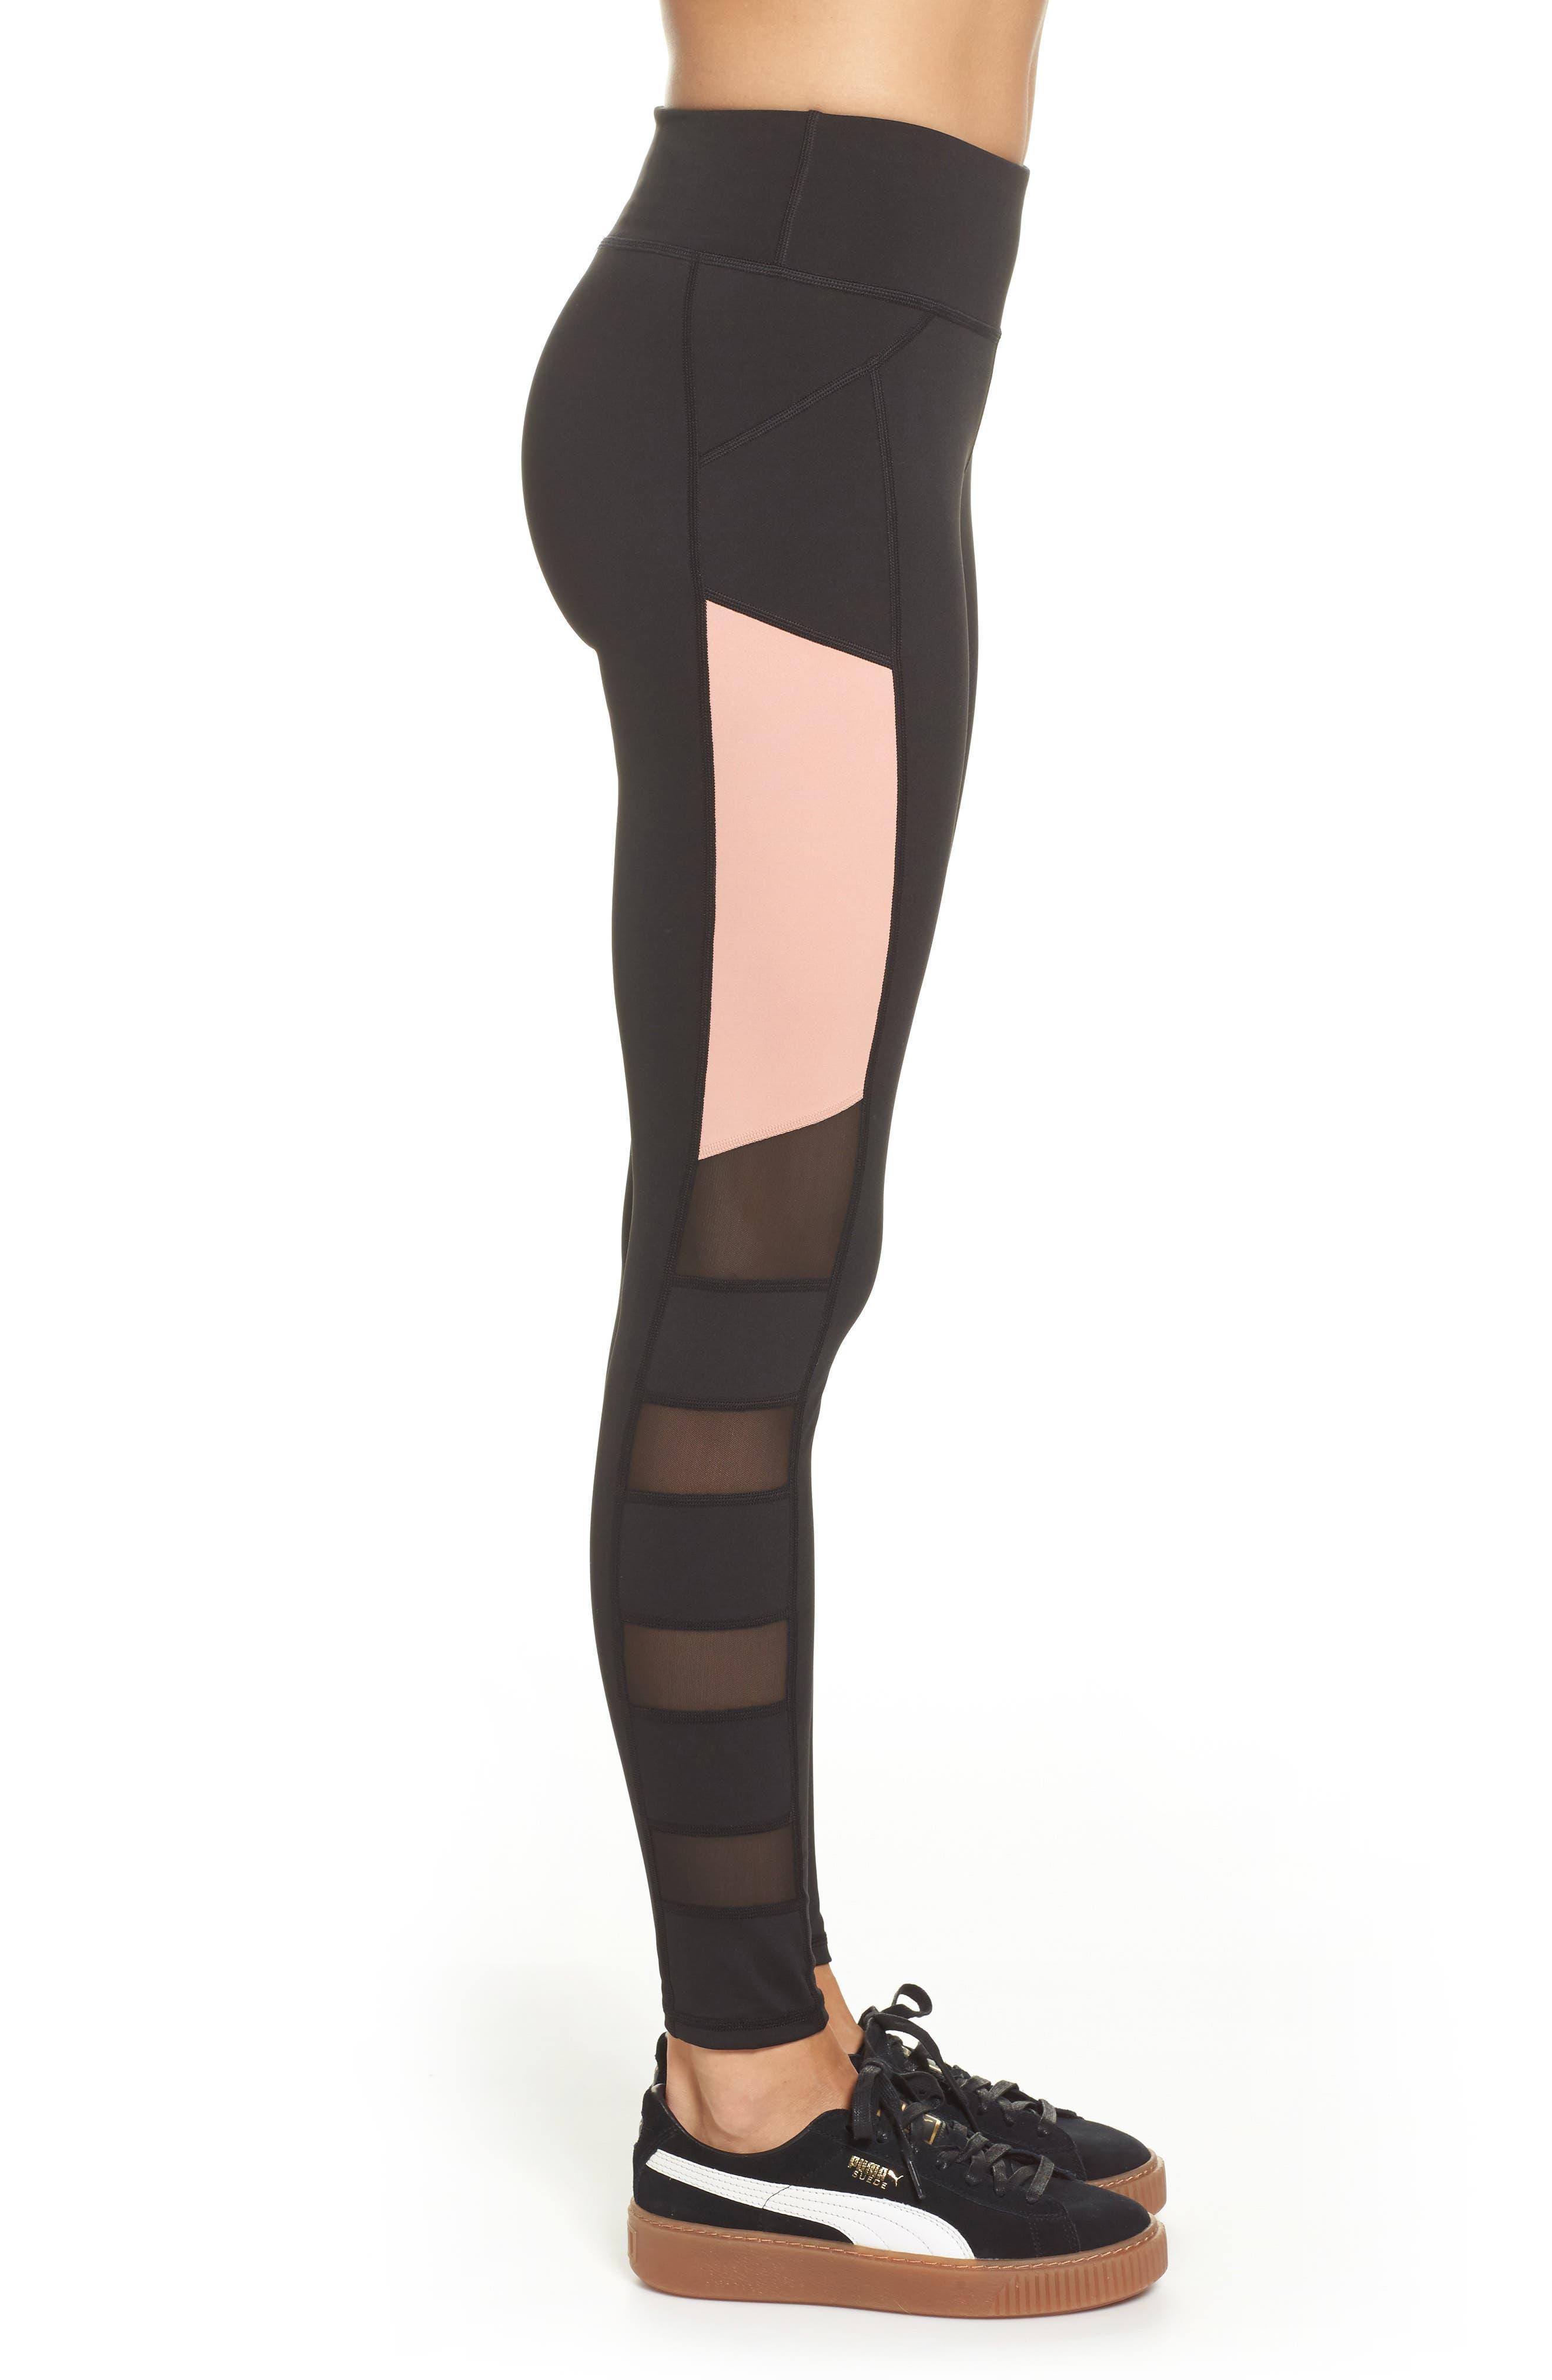 Sharp Shape Tights,                             Alternate thumbnail 4, color,                             Puma Black-Peach Beige